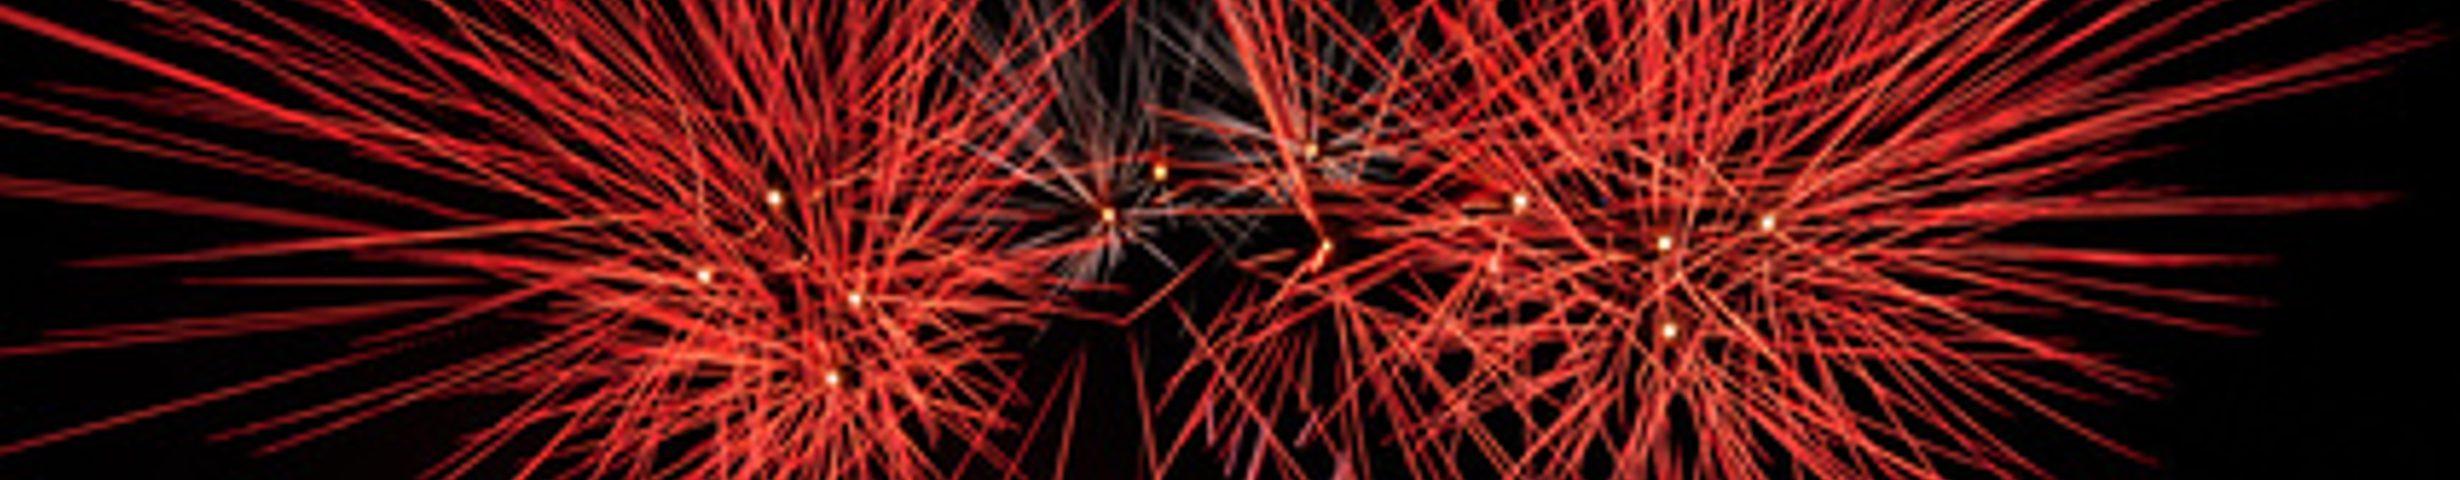 Feuerwerk Allgäu